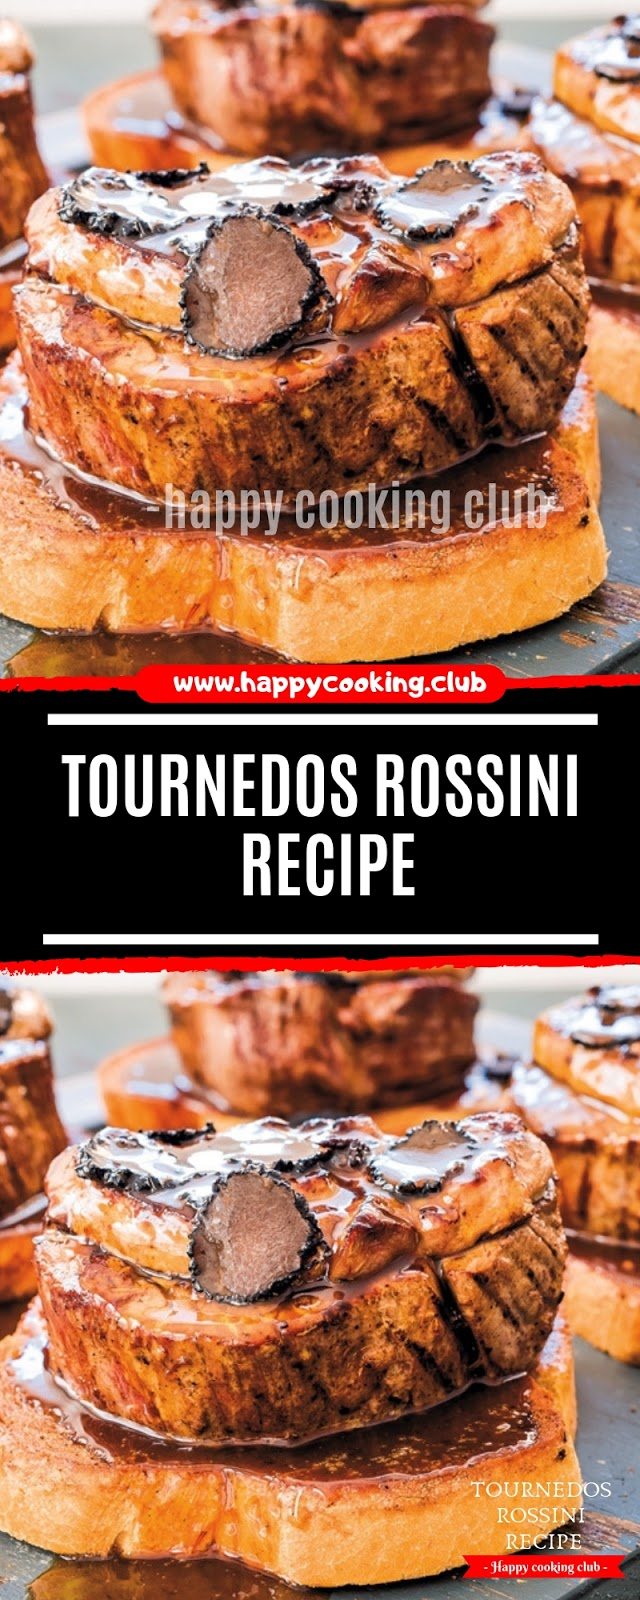 Tournedos Rossini Recipe